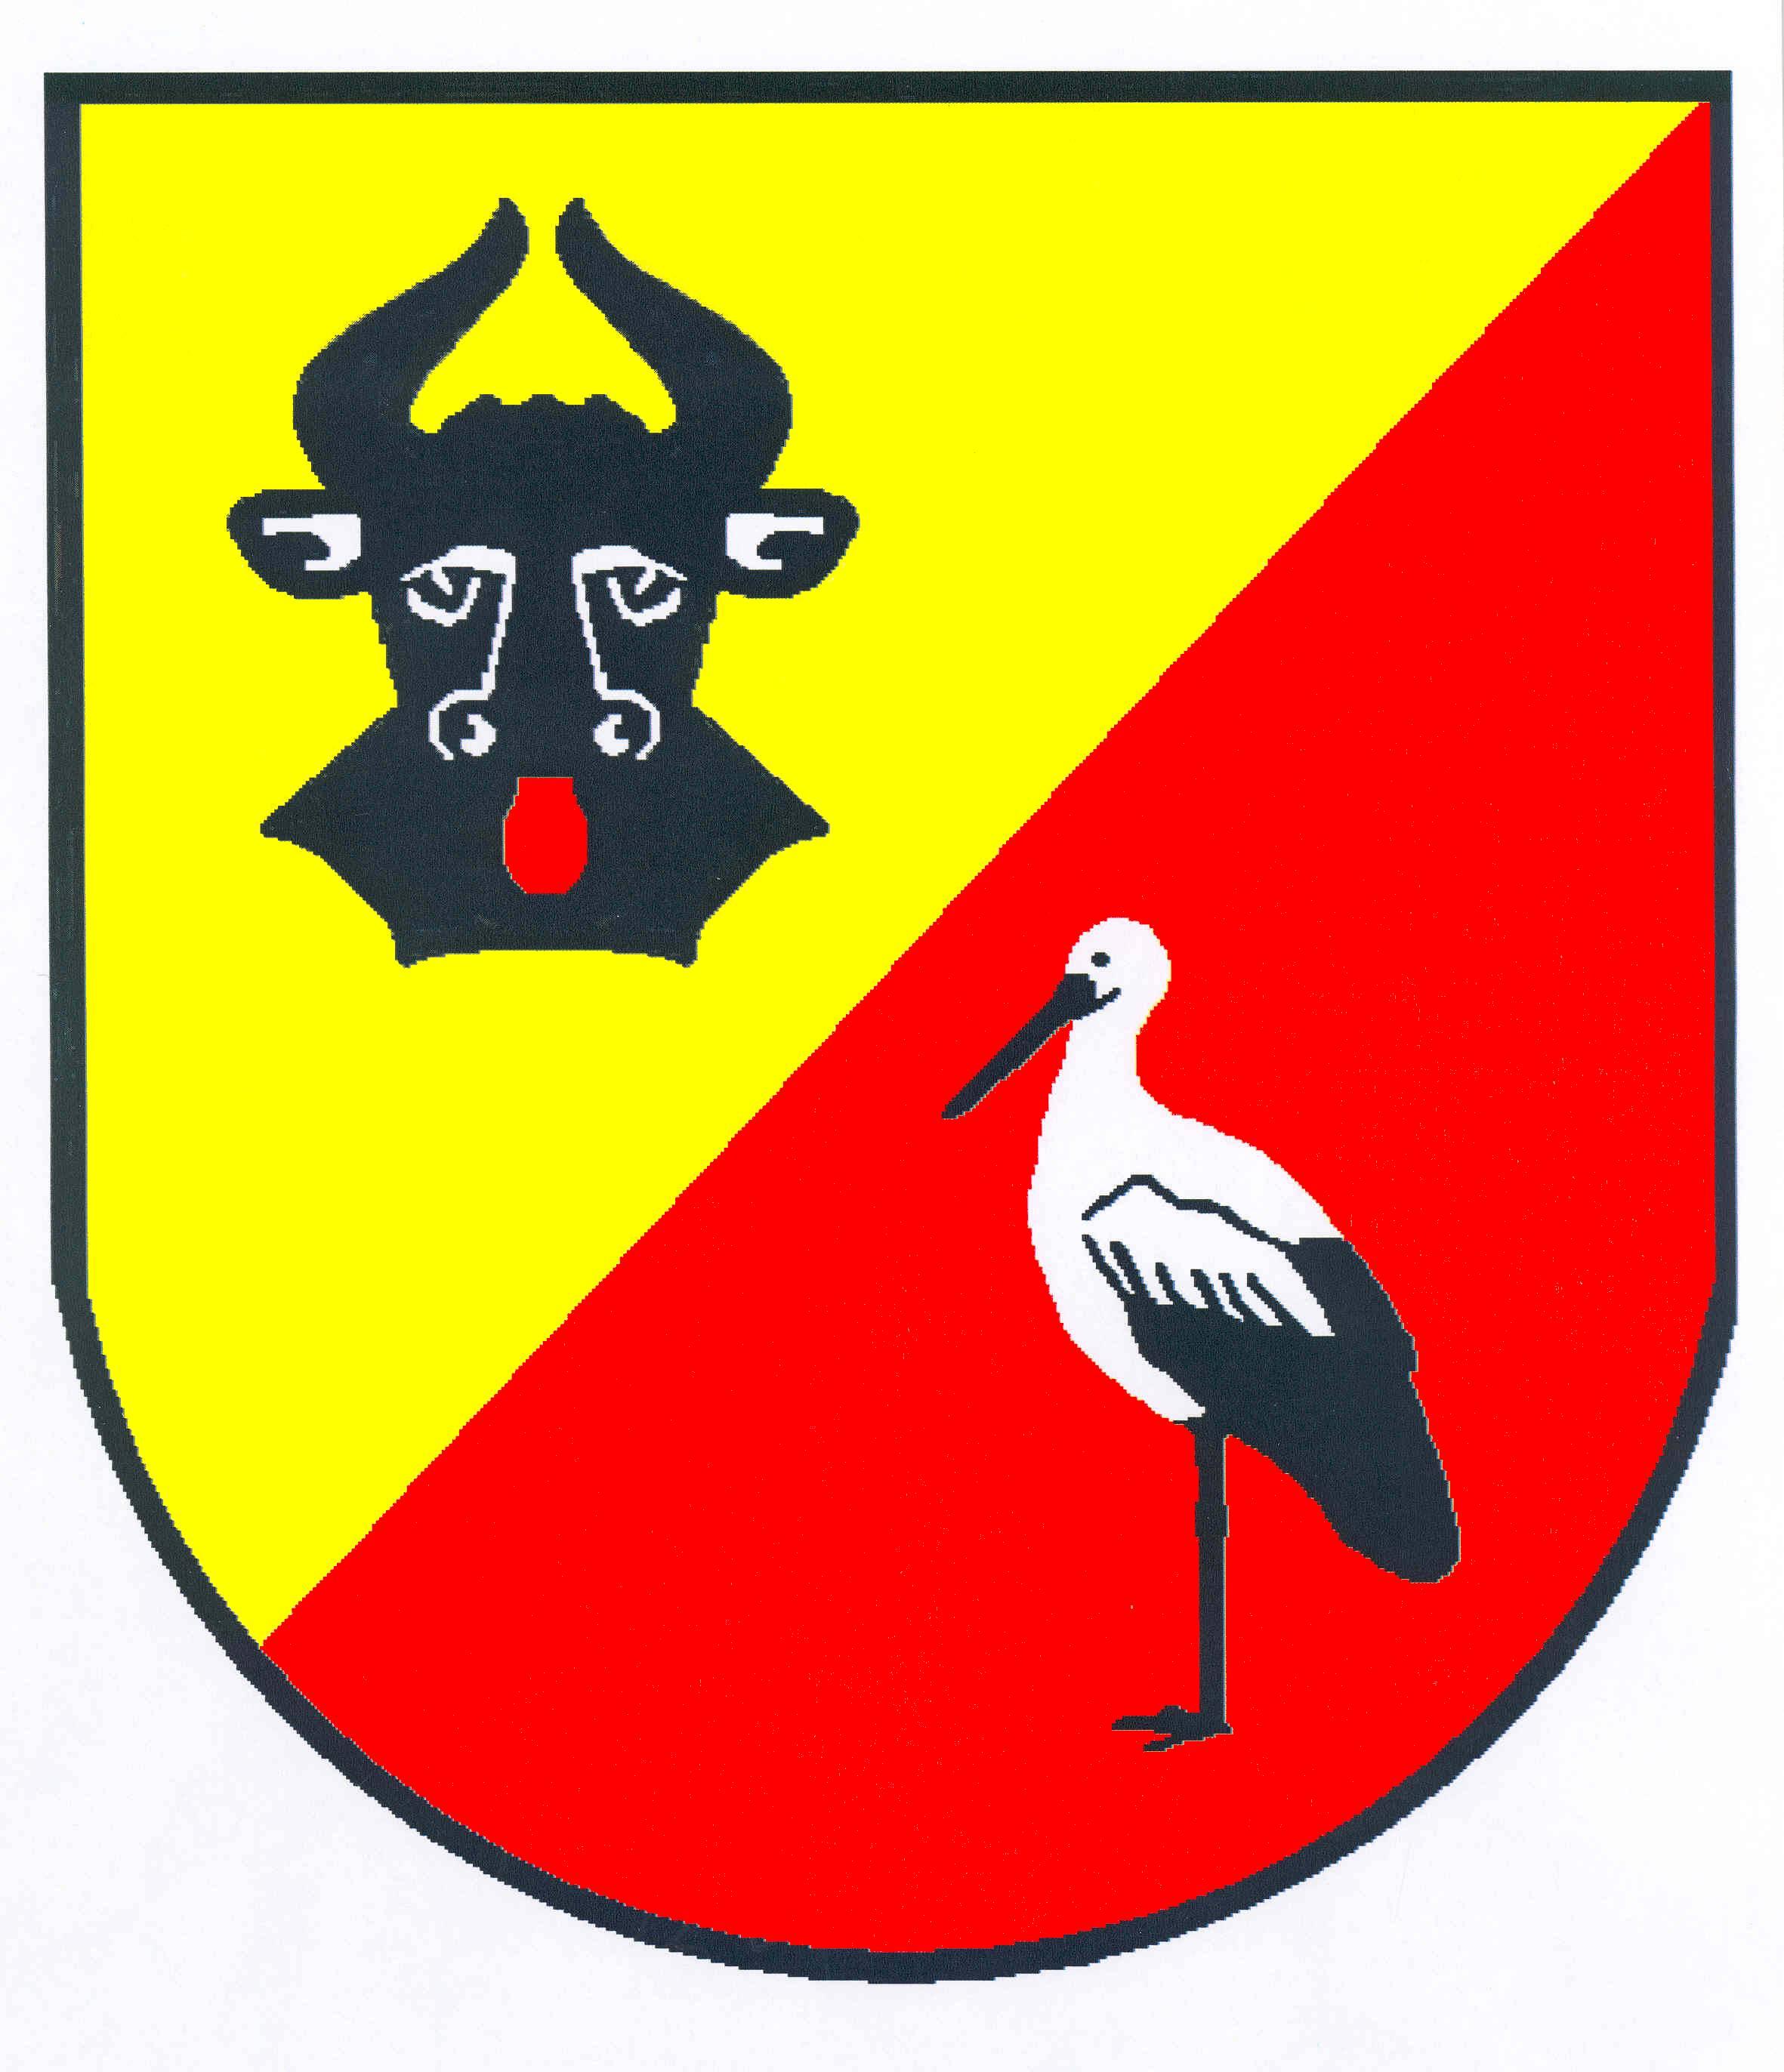 Wappen GemeindeWalksfelde, Kreis Herzogtum Lauenburg